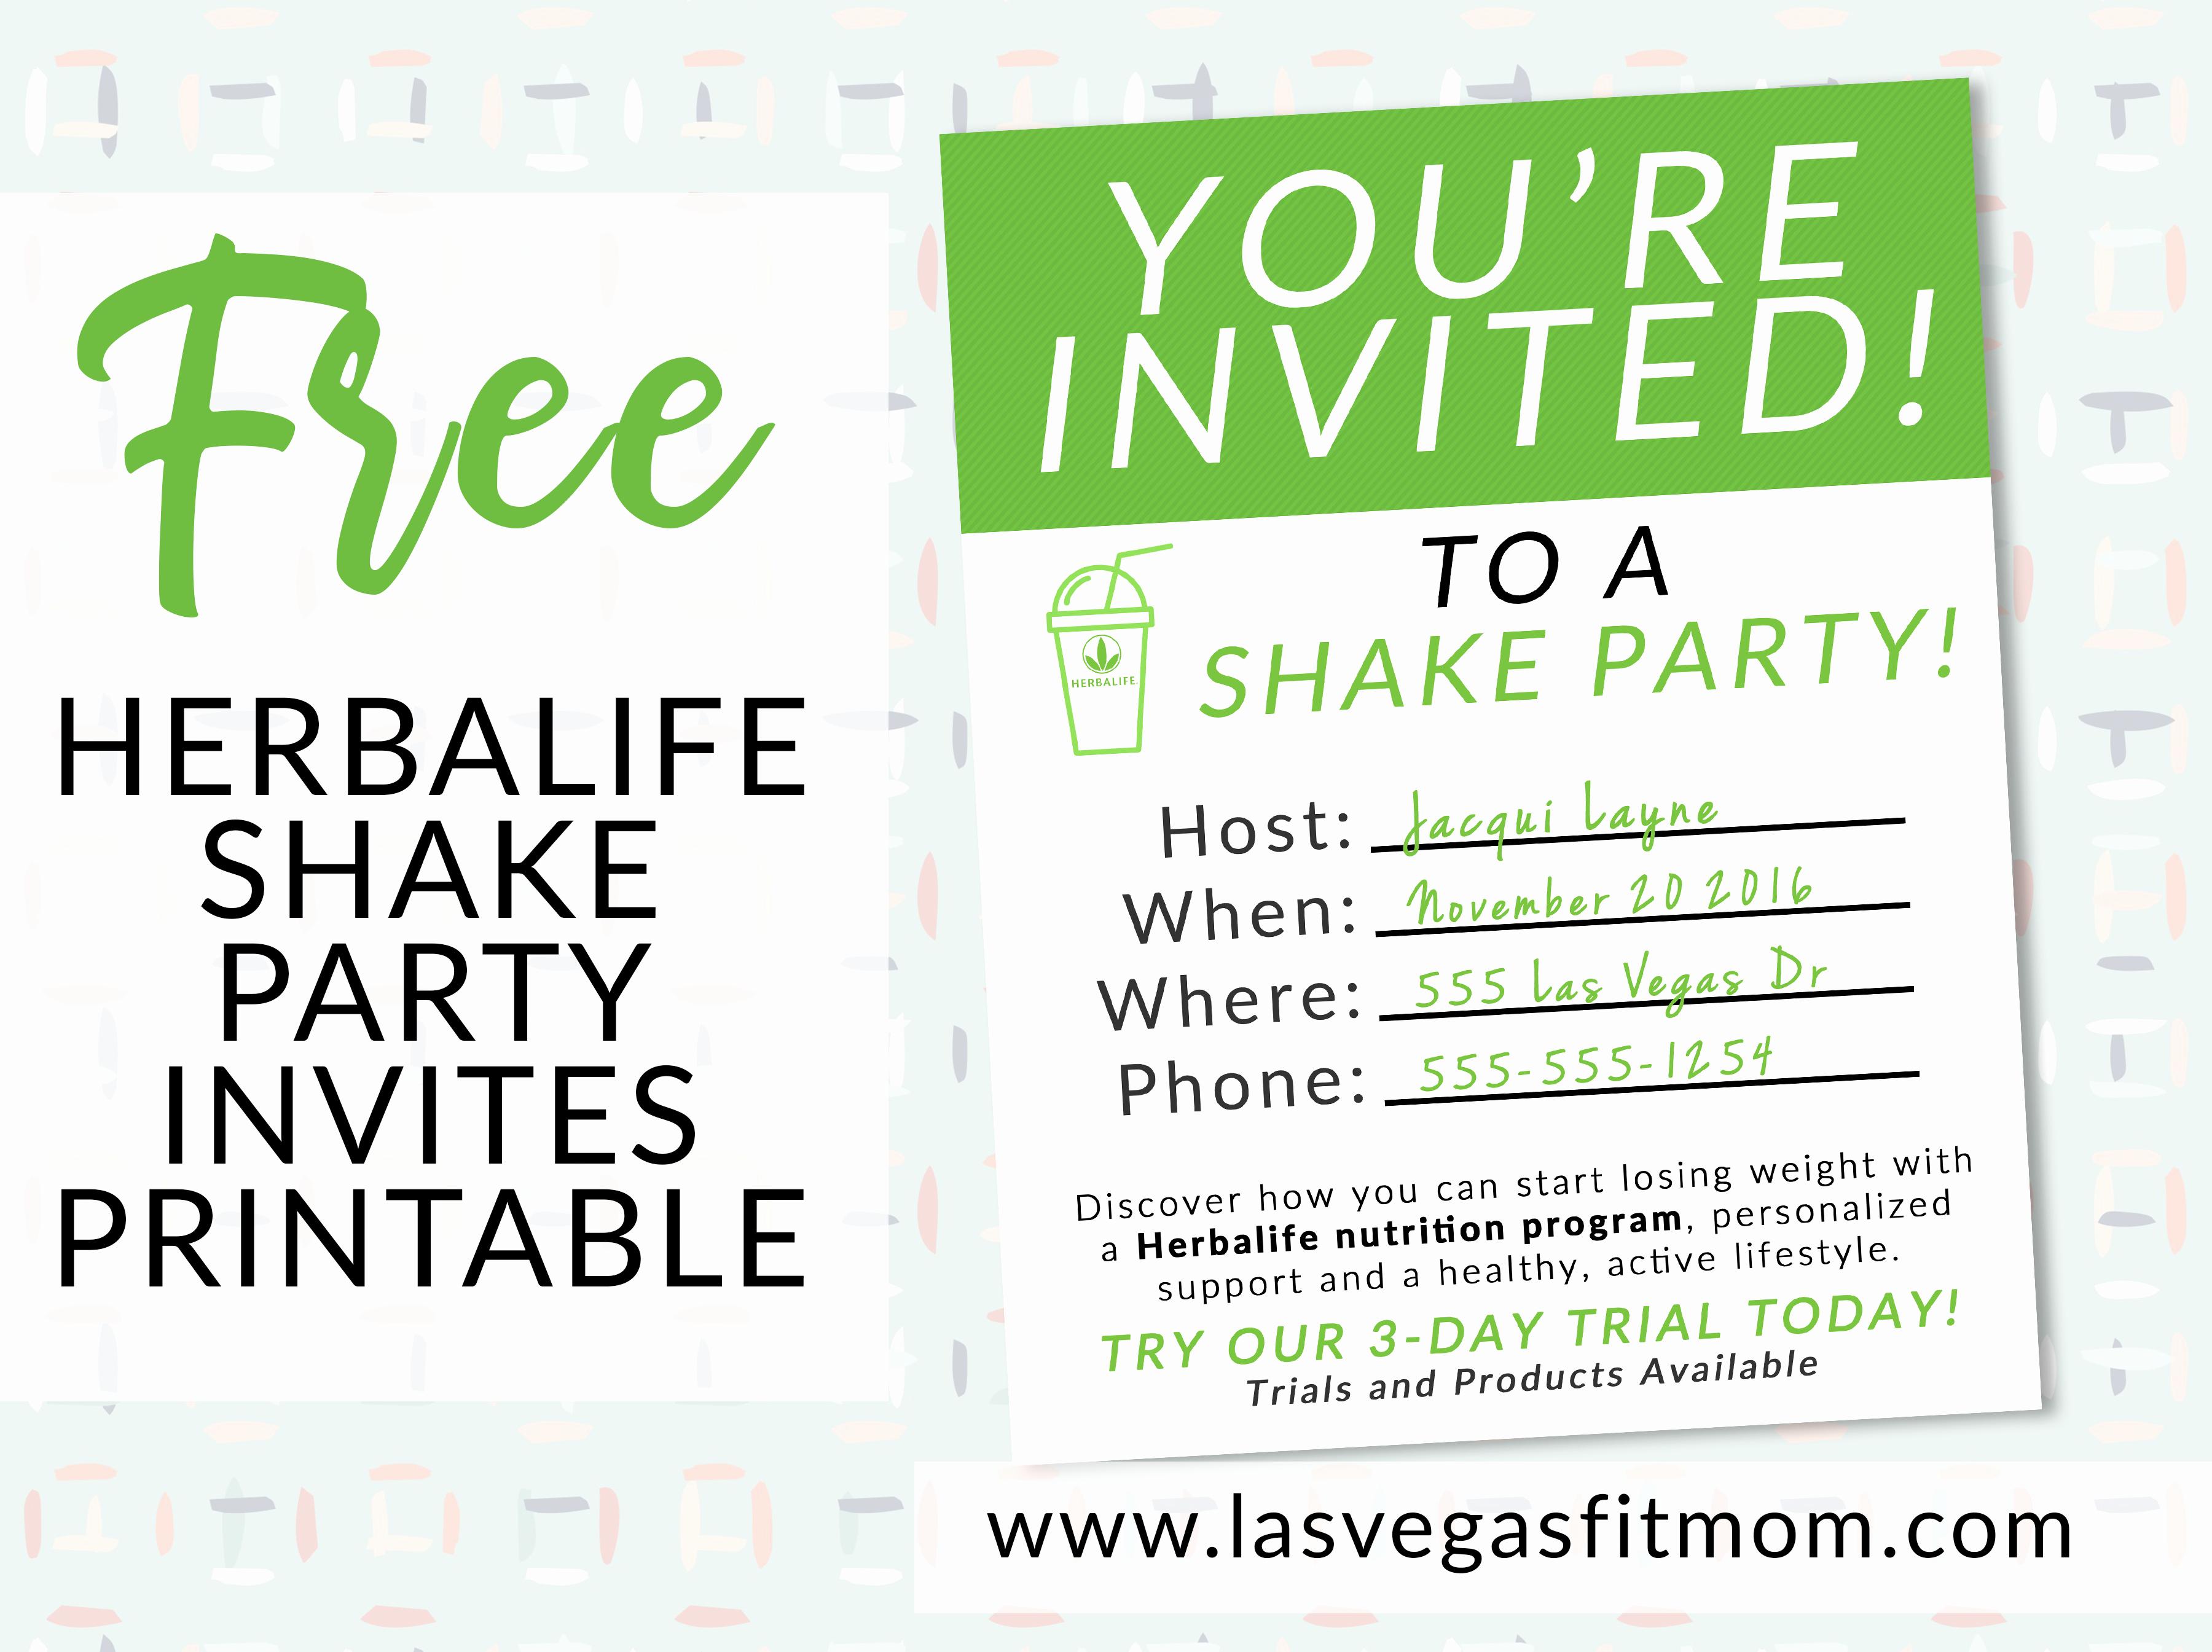 Shake Party Herbalife Beautiful Herbalife Shake Party Invites – Free Printable – Las Vegas